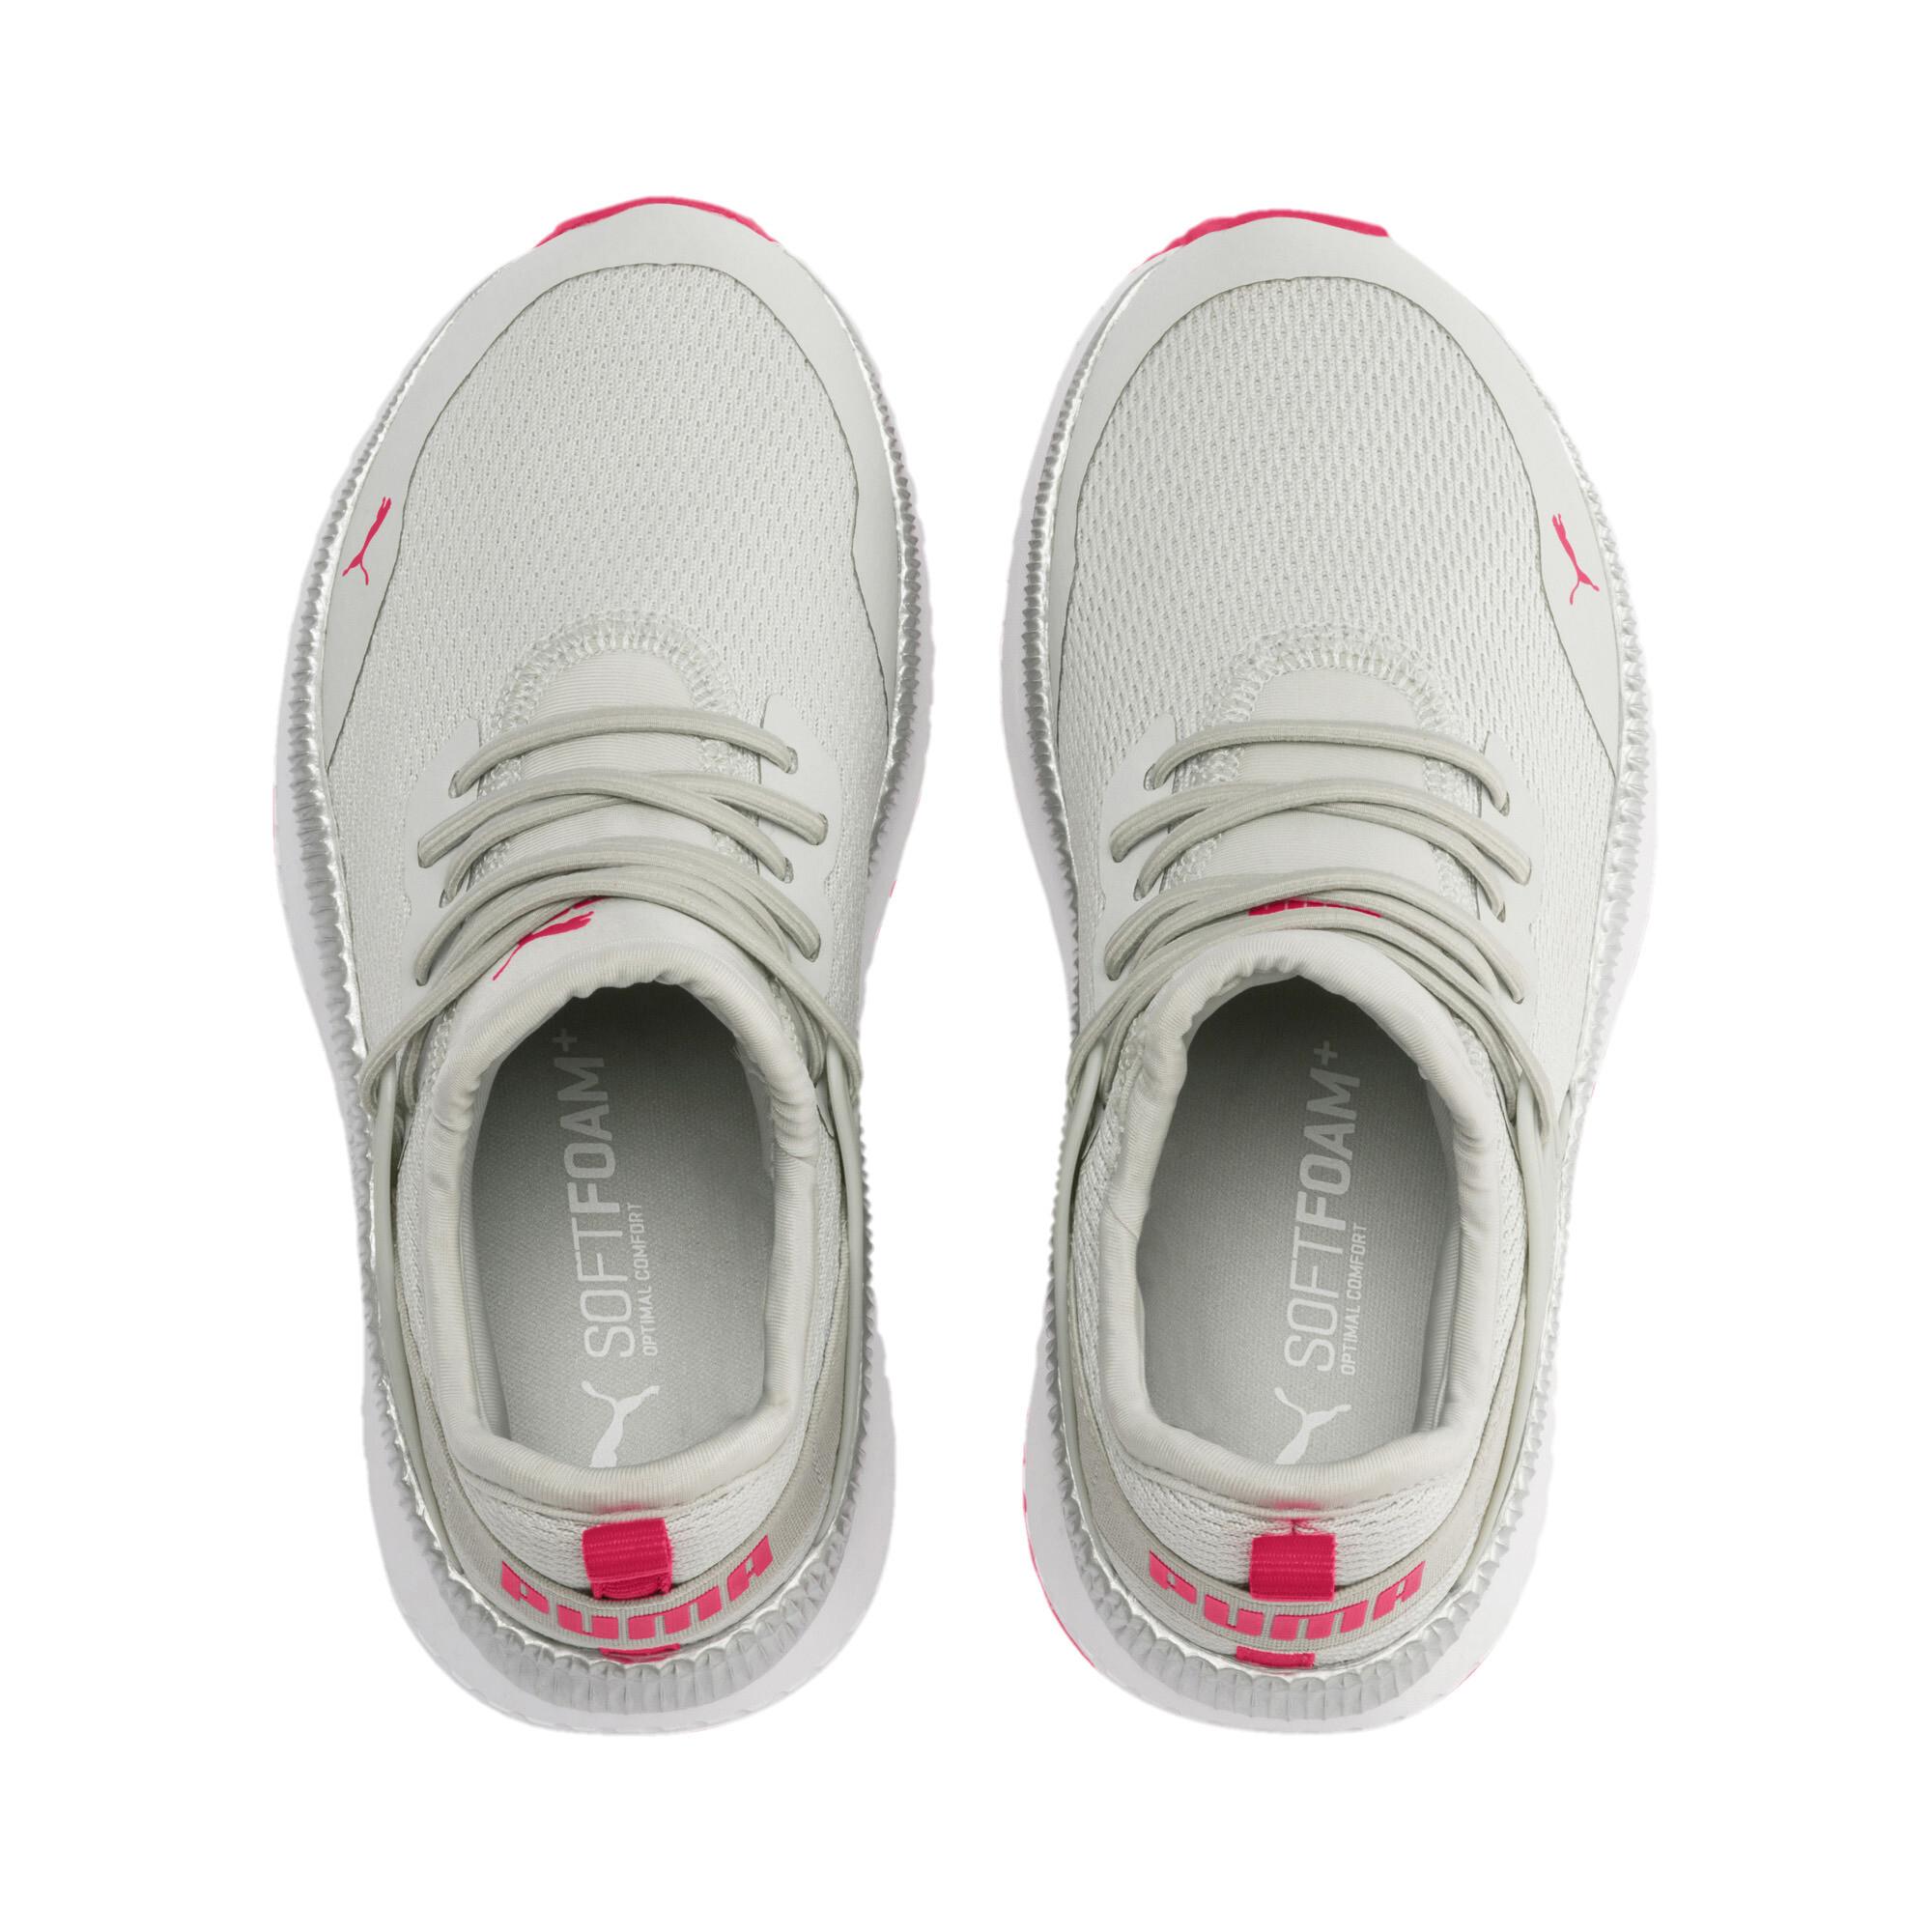 PUMA-Pacer-Next-Cage-Metallic-Little-Kids-039-Shoes-Girls-Shoe-Kids thumbnail 7